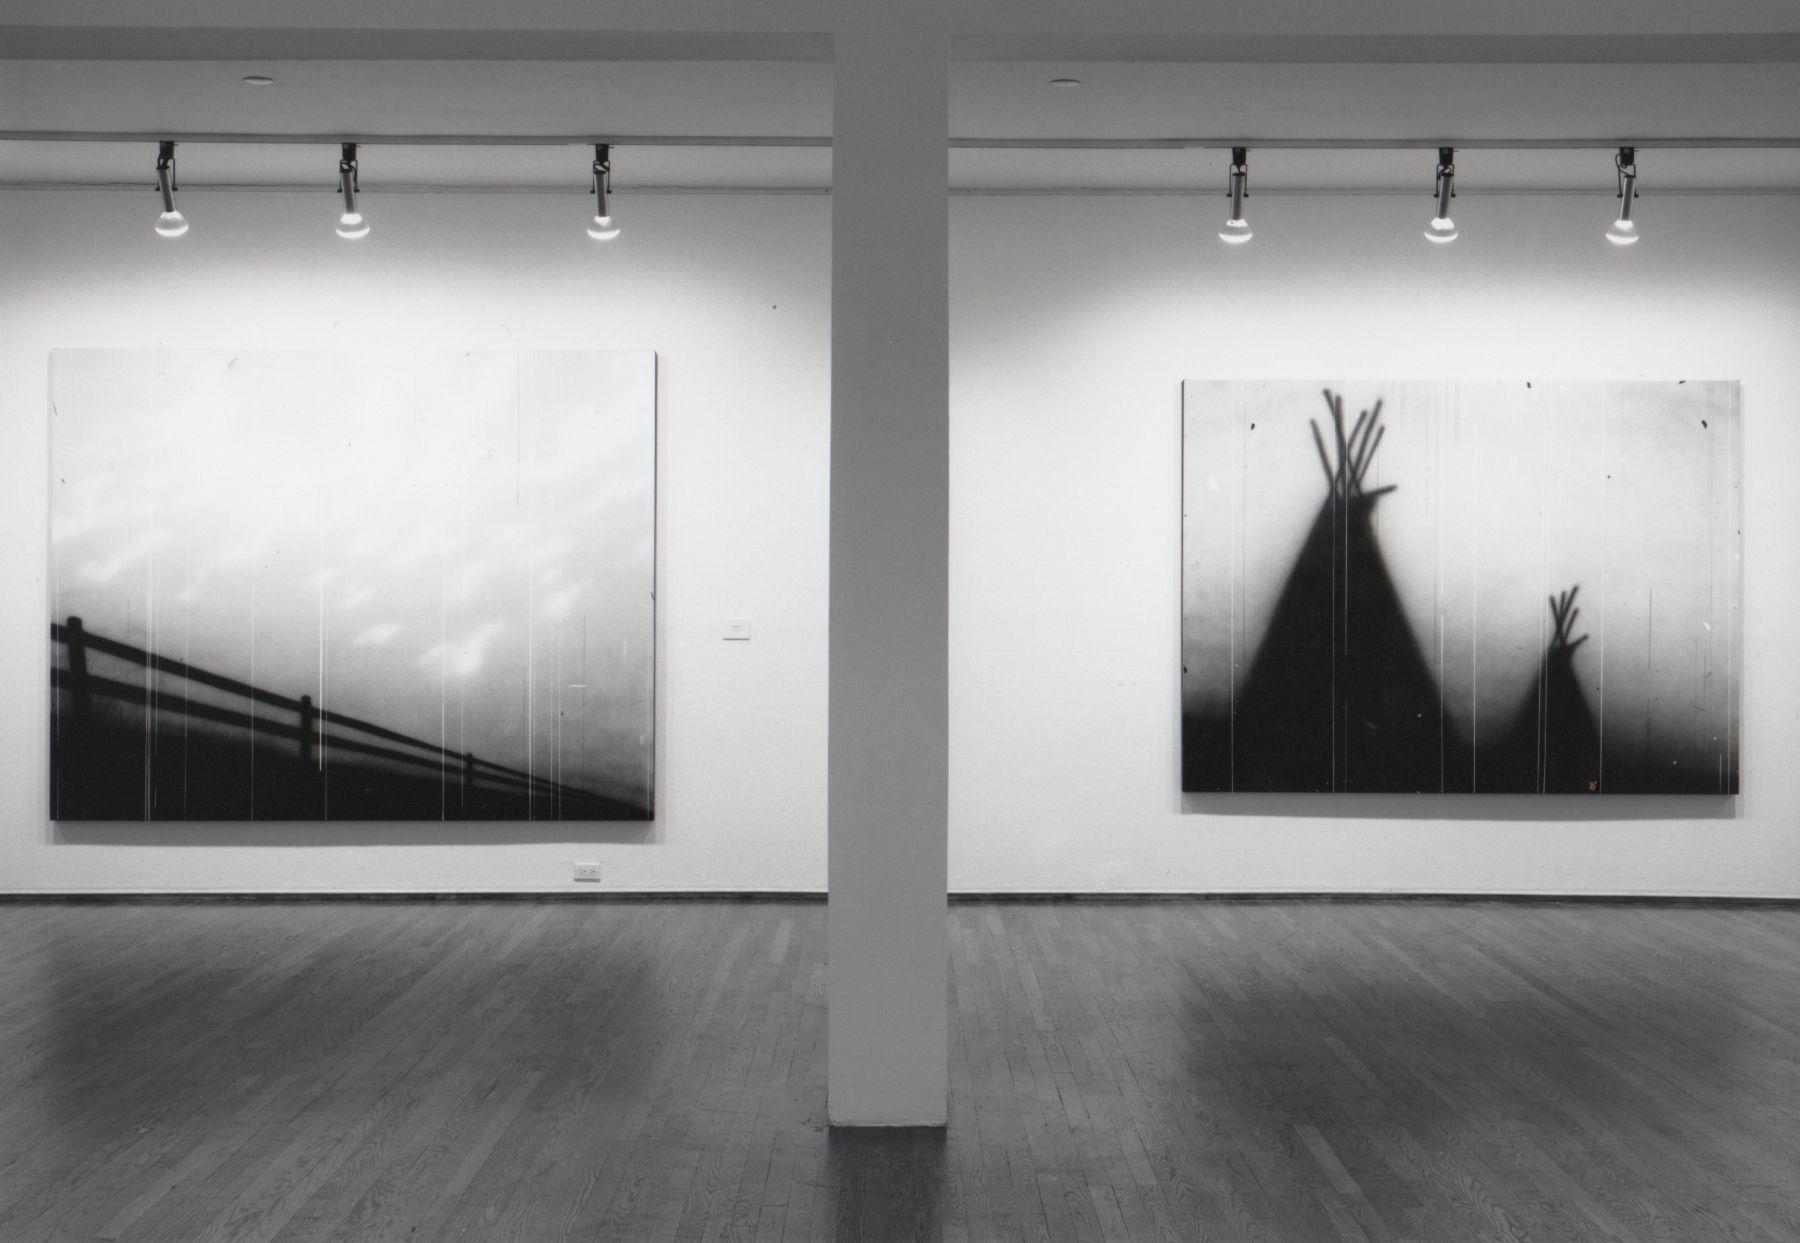 Installation view, Ed Ruscha, 420 WEST BROADWAY